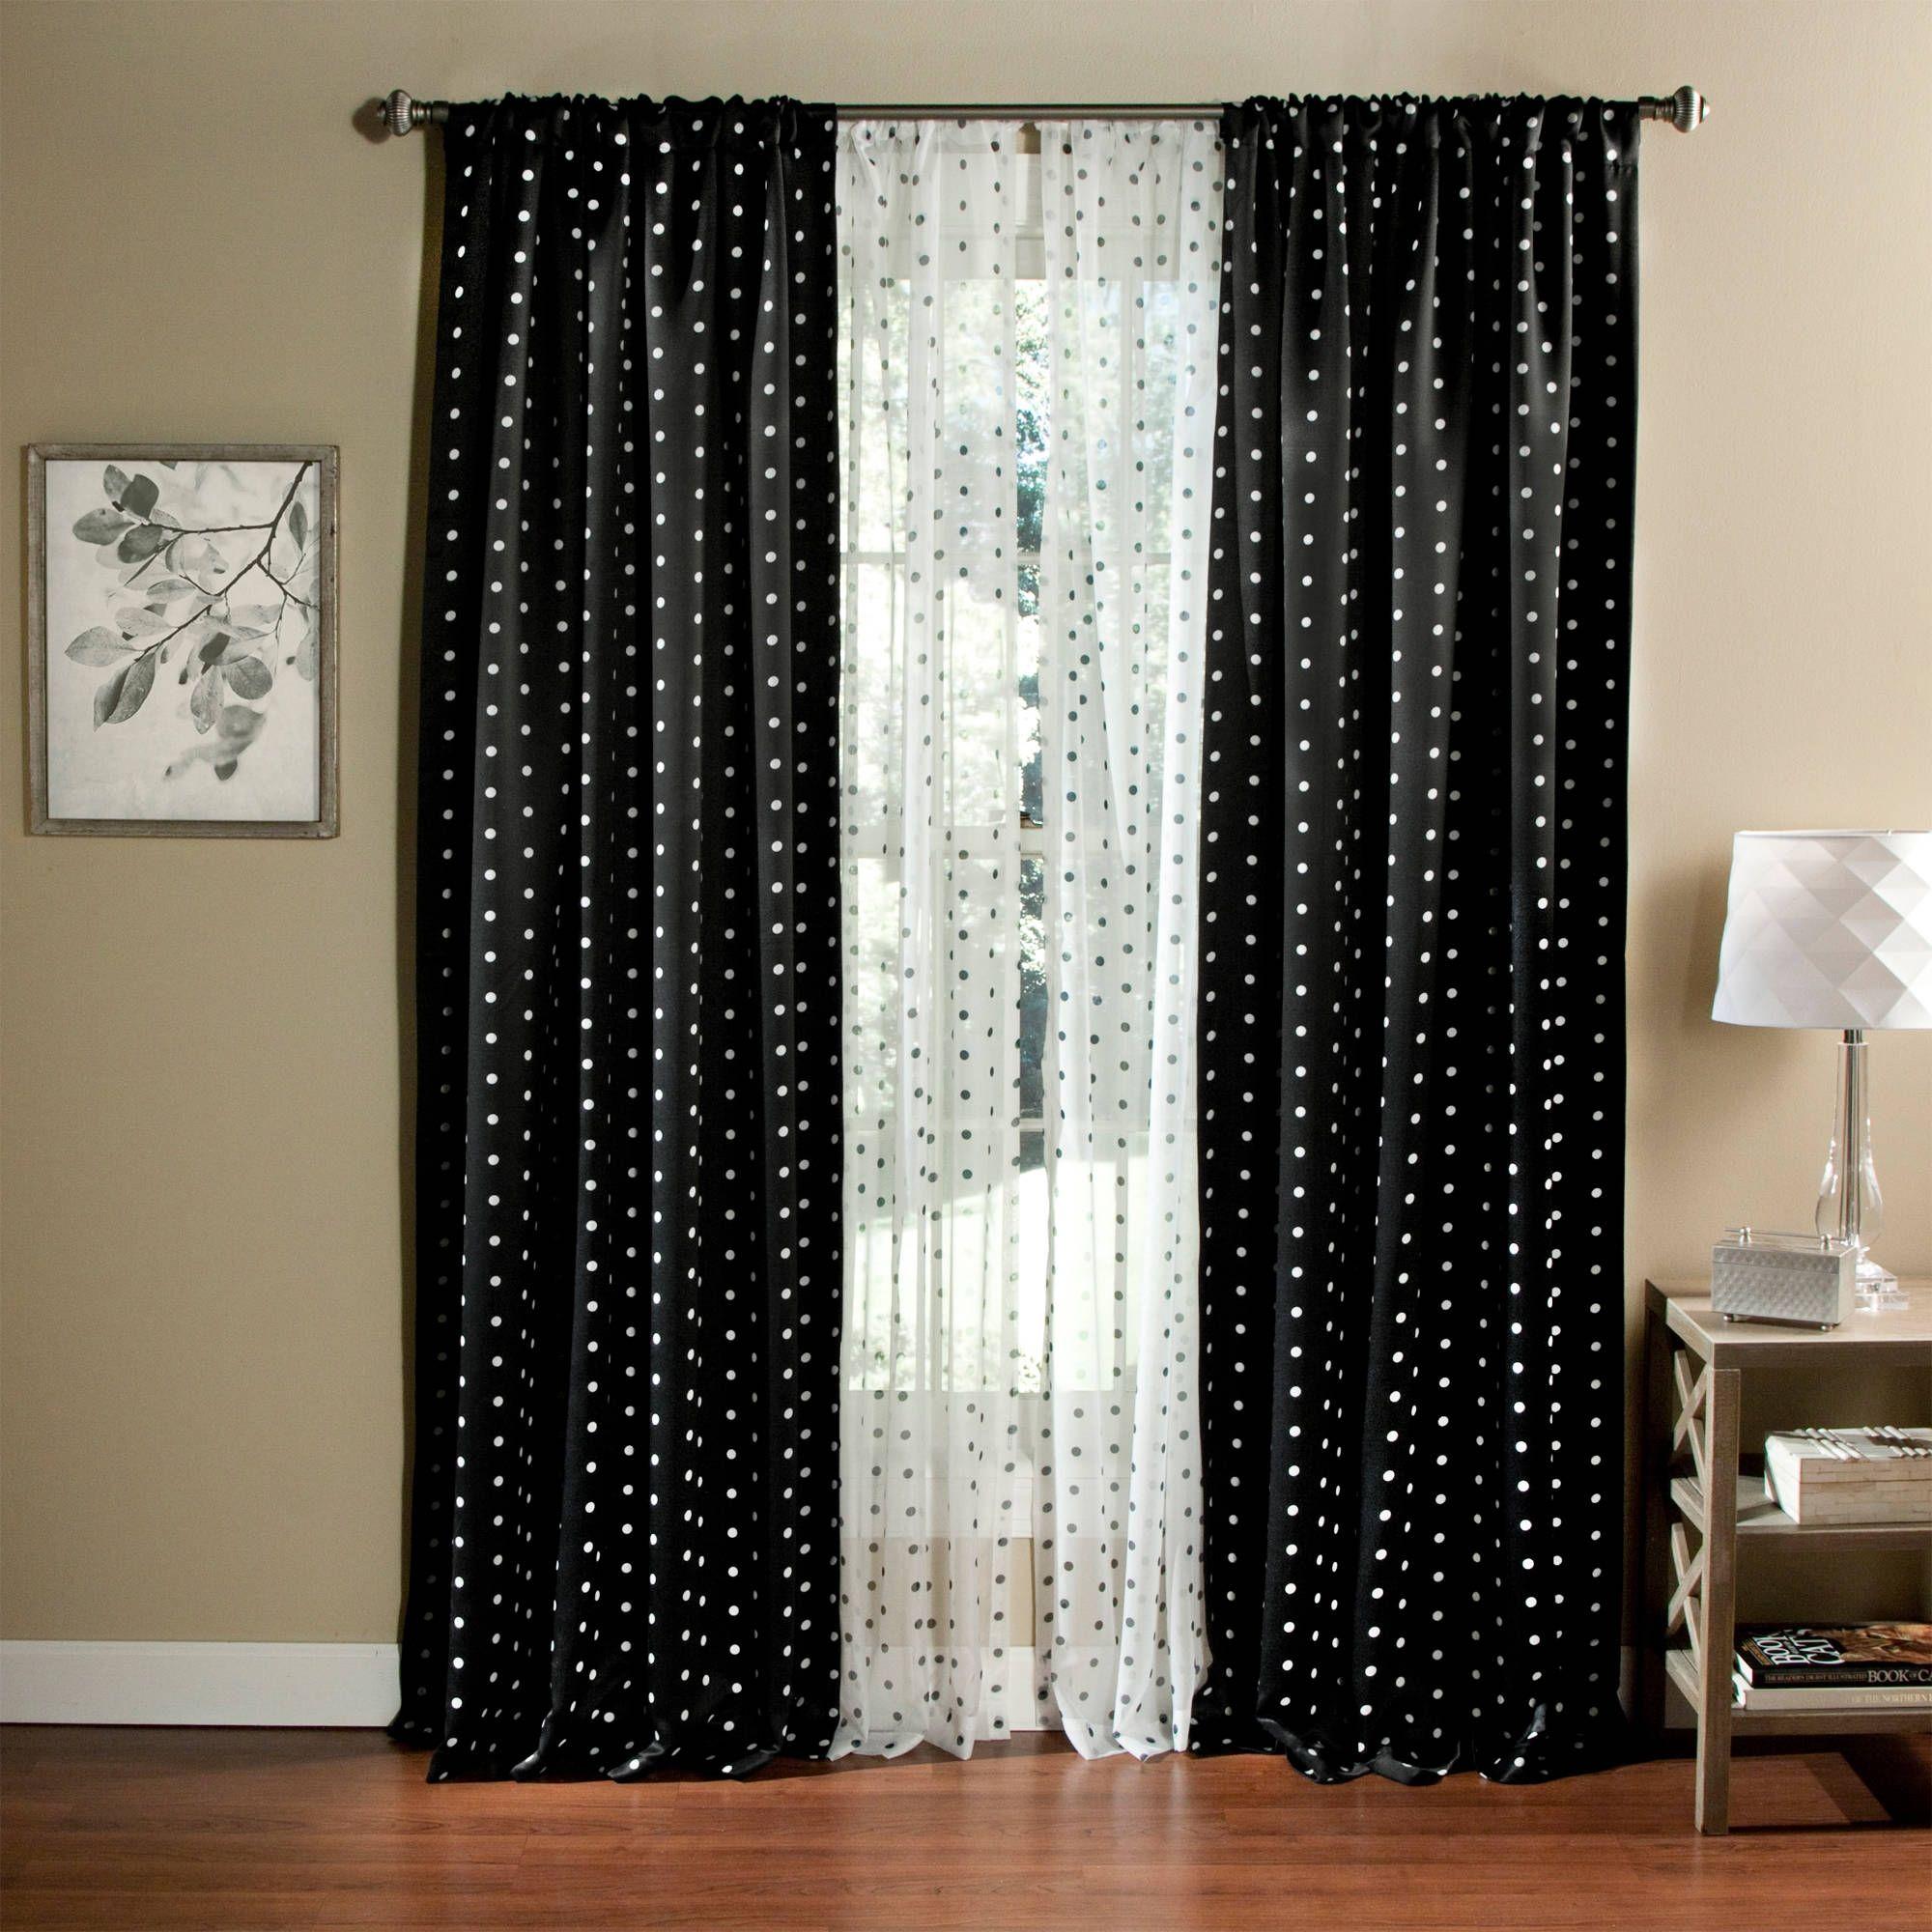 Sears Bathroom Curtains Windows | http://realtag.info | Pinterest